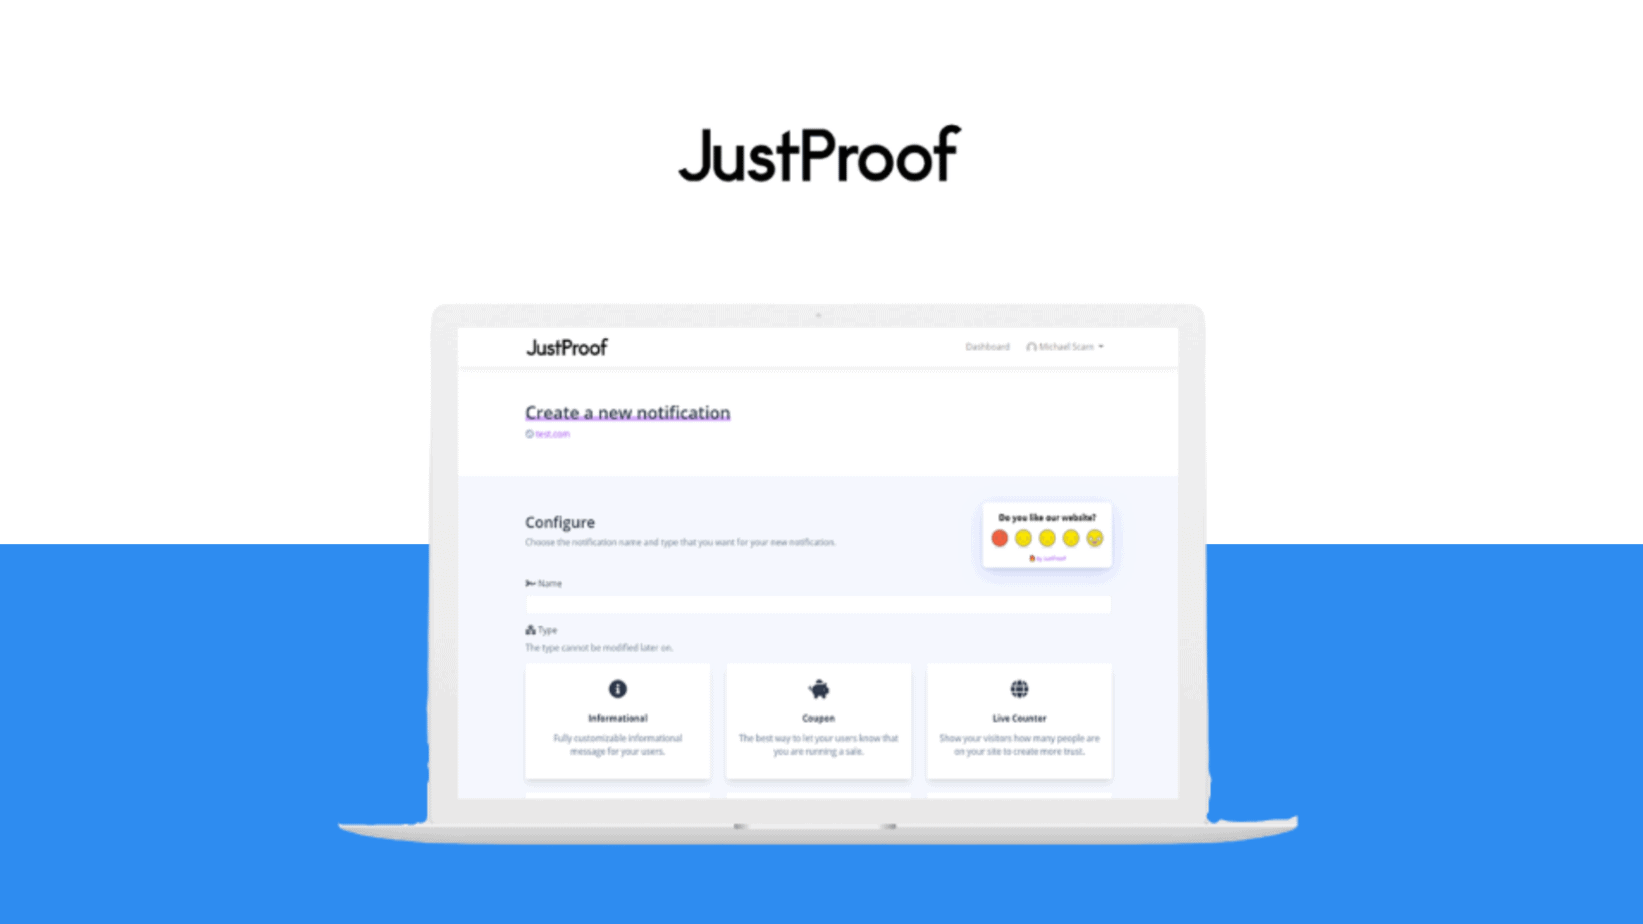 JustProof Lifetime Deal